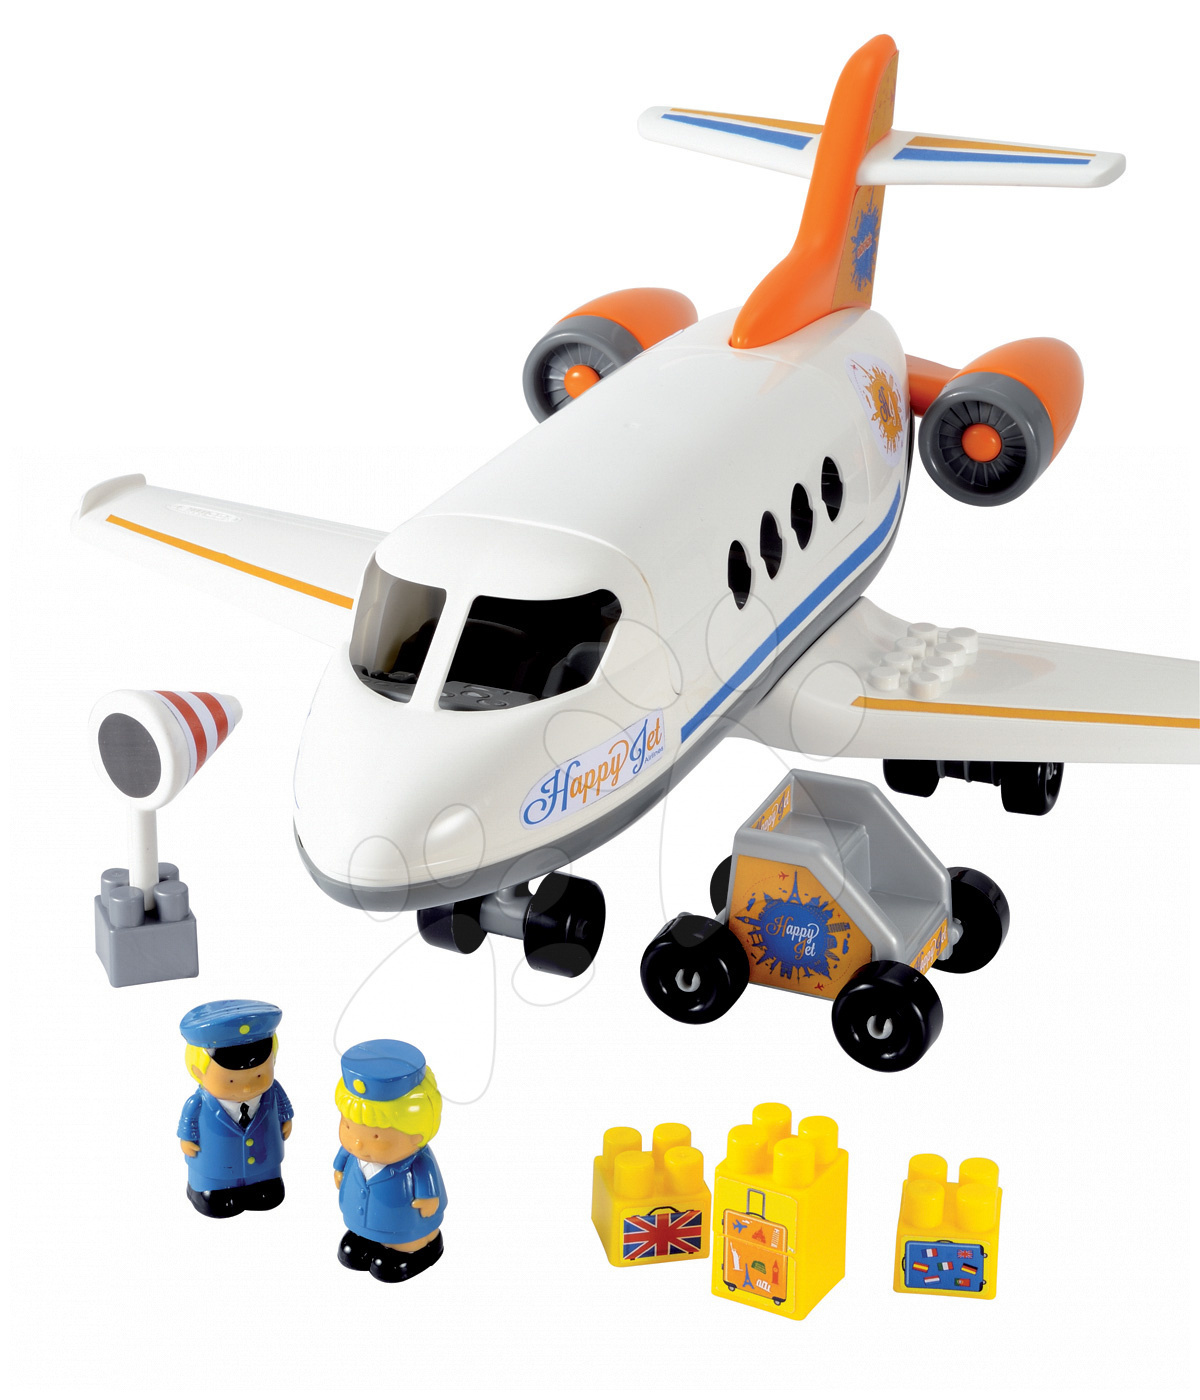 Stavebnica lietadlo Abrick Écoiffier s 2 figúrkami od 18 mes